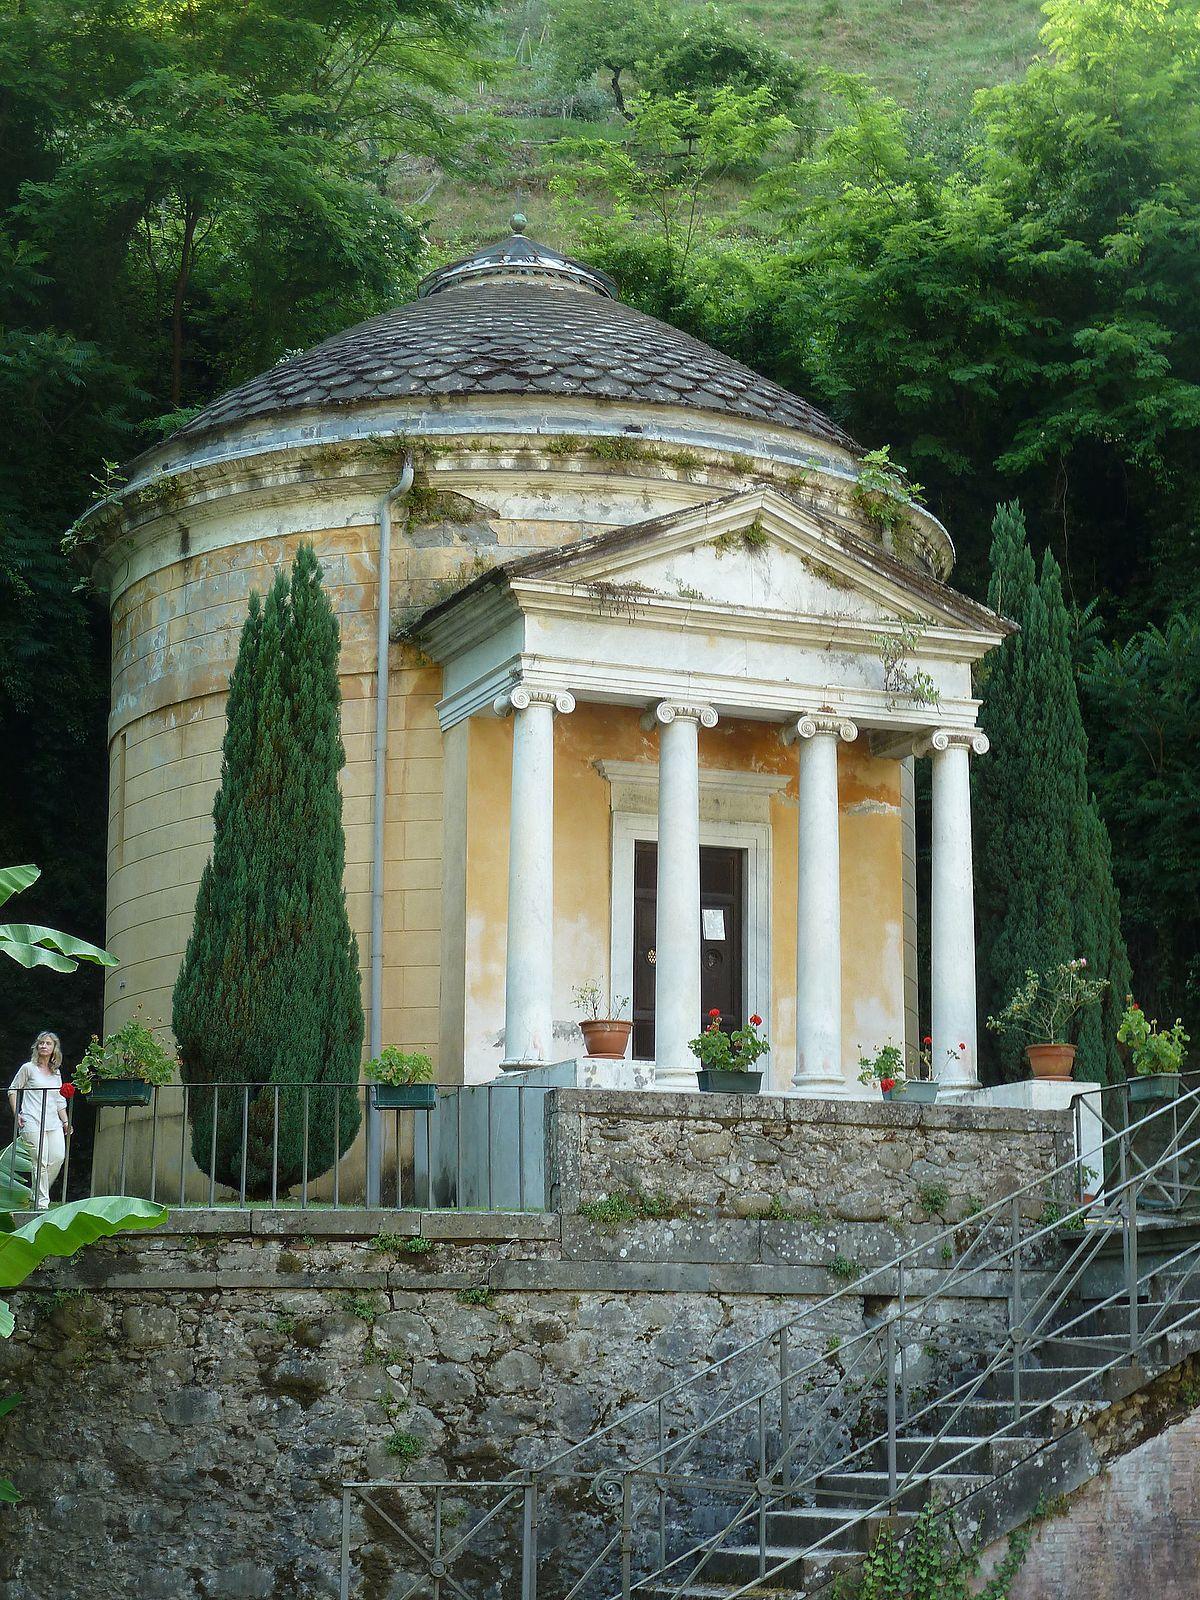 Cappella demidoff bagni di lucca wikipedia - Bagno di lucca ...